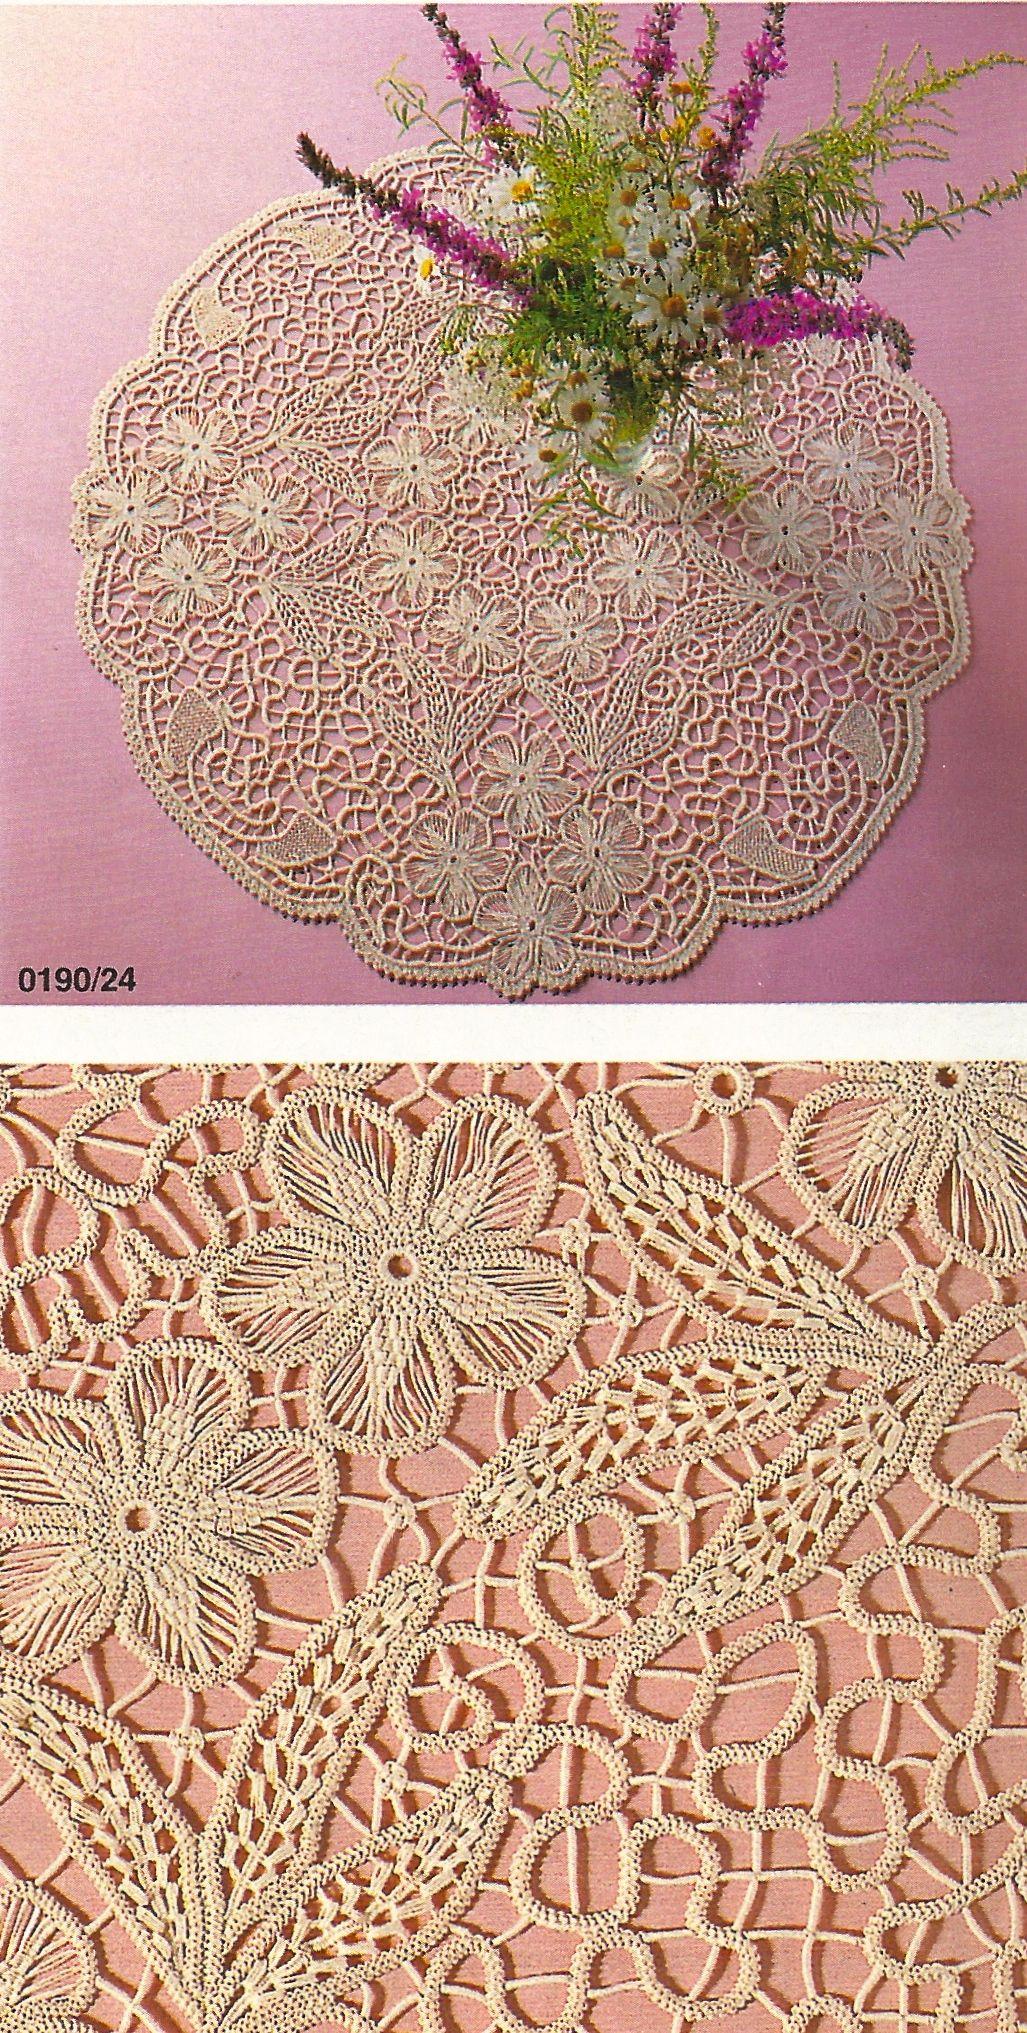 Macramé Crochet Lace – Anna Burda January 1990 | Encaje, Crochet ...